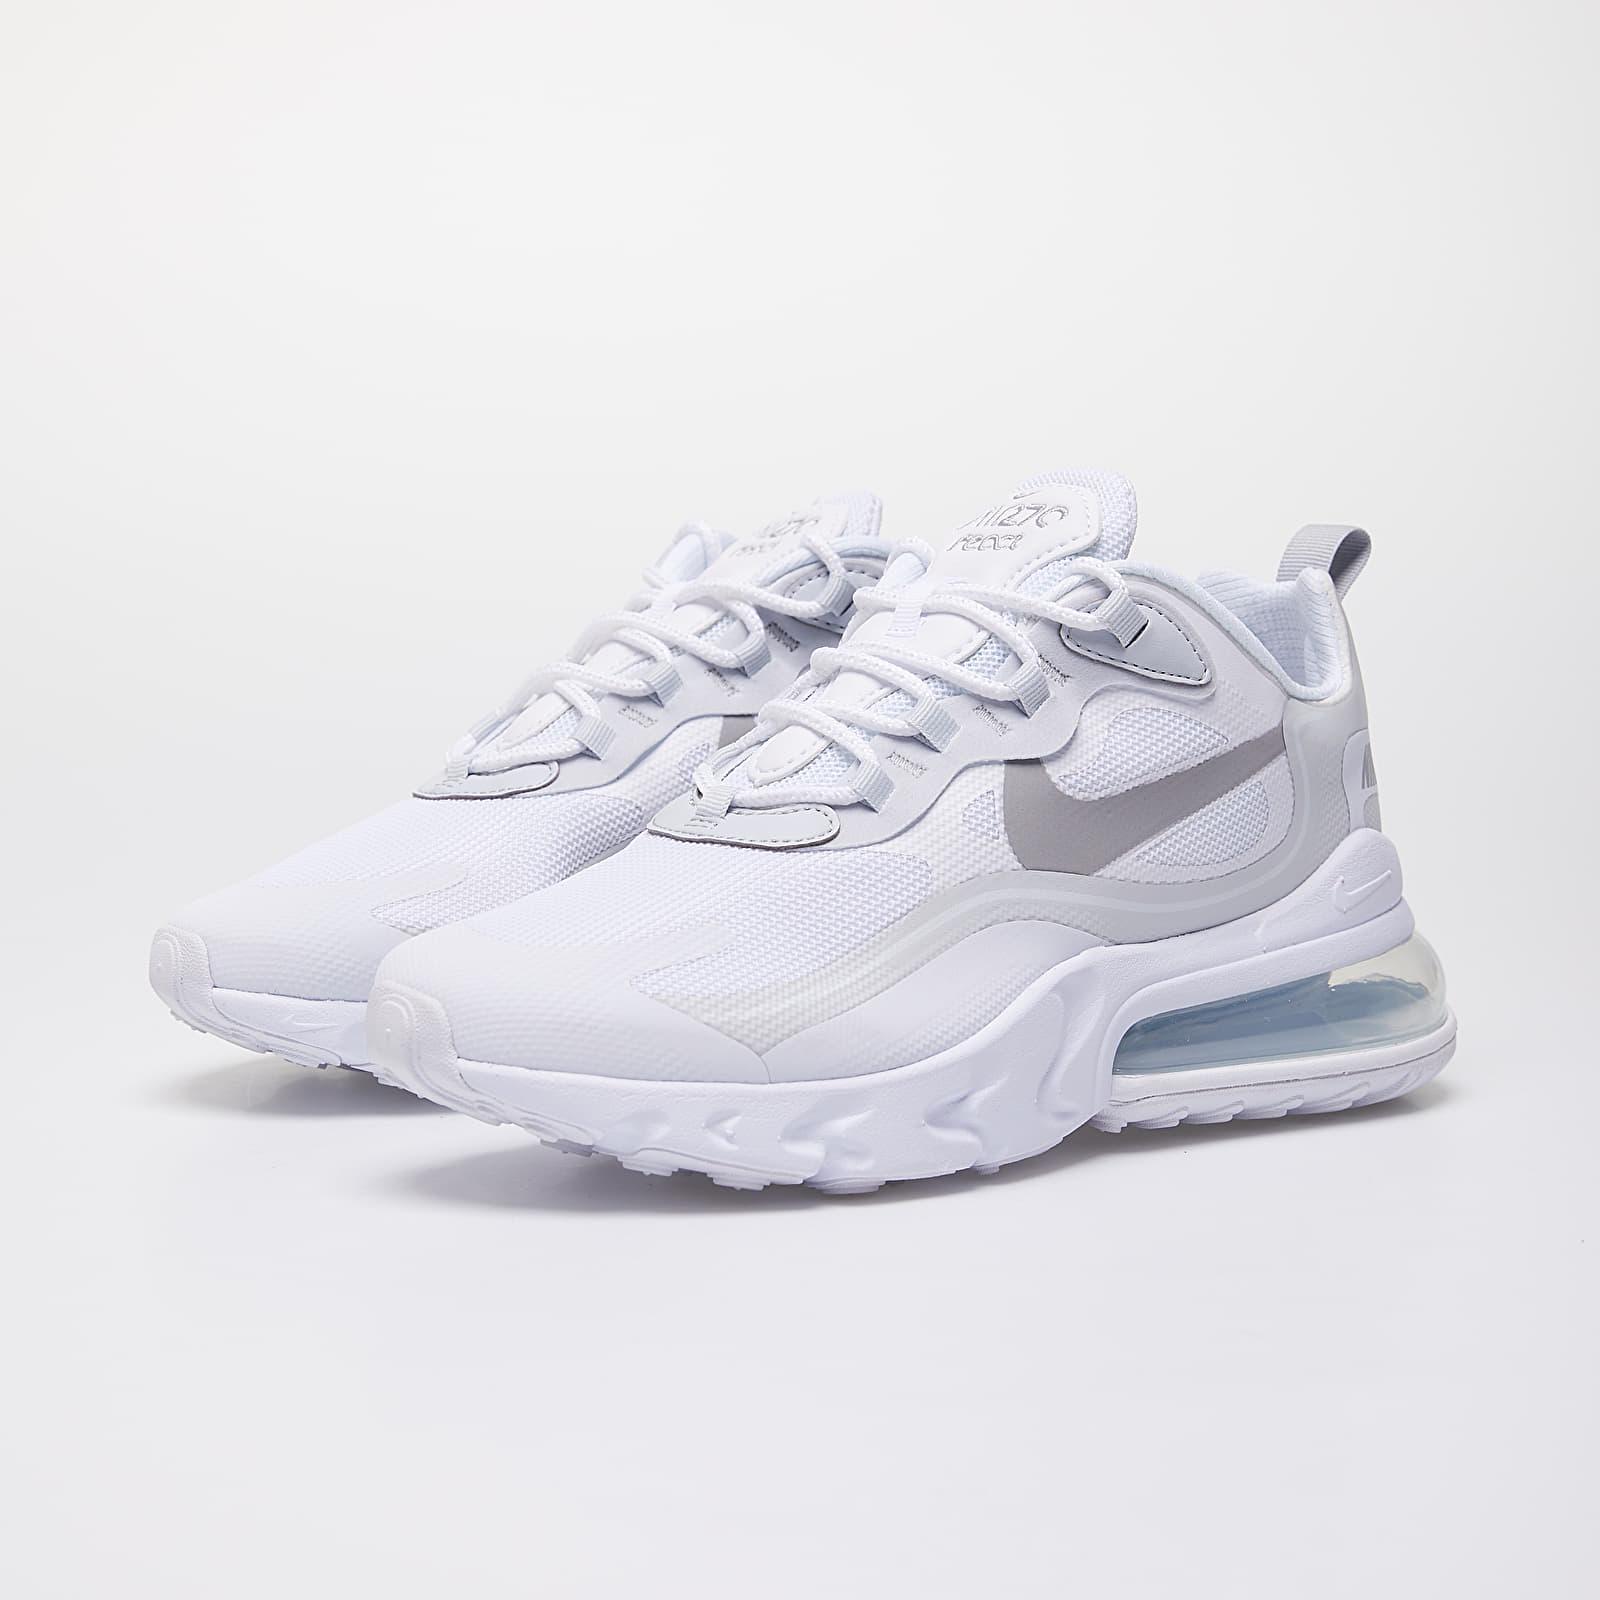 Nike Air Max 270 React White/ Lt Smoke Grey-Pure Platinum   Footshop